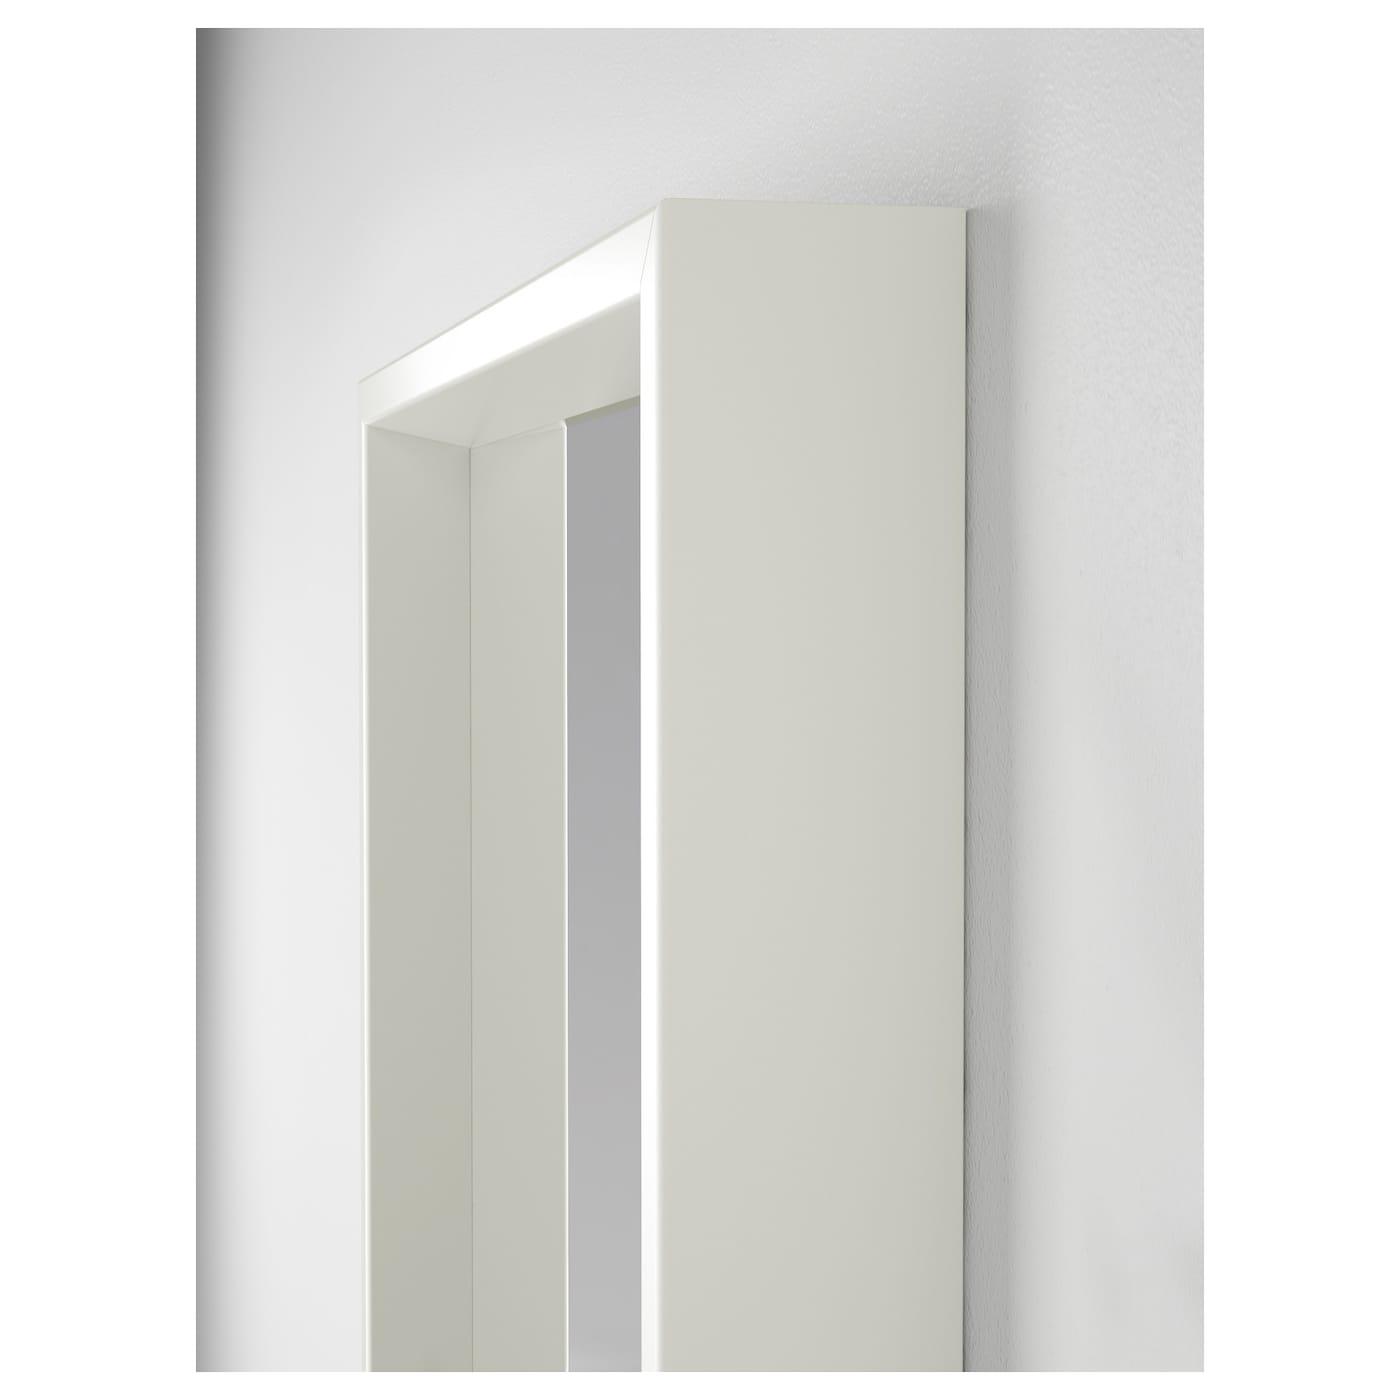 NISSEDAL Espejo, blanco, 40x150 cm IKEA